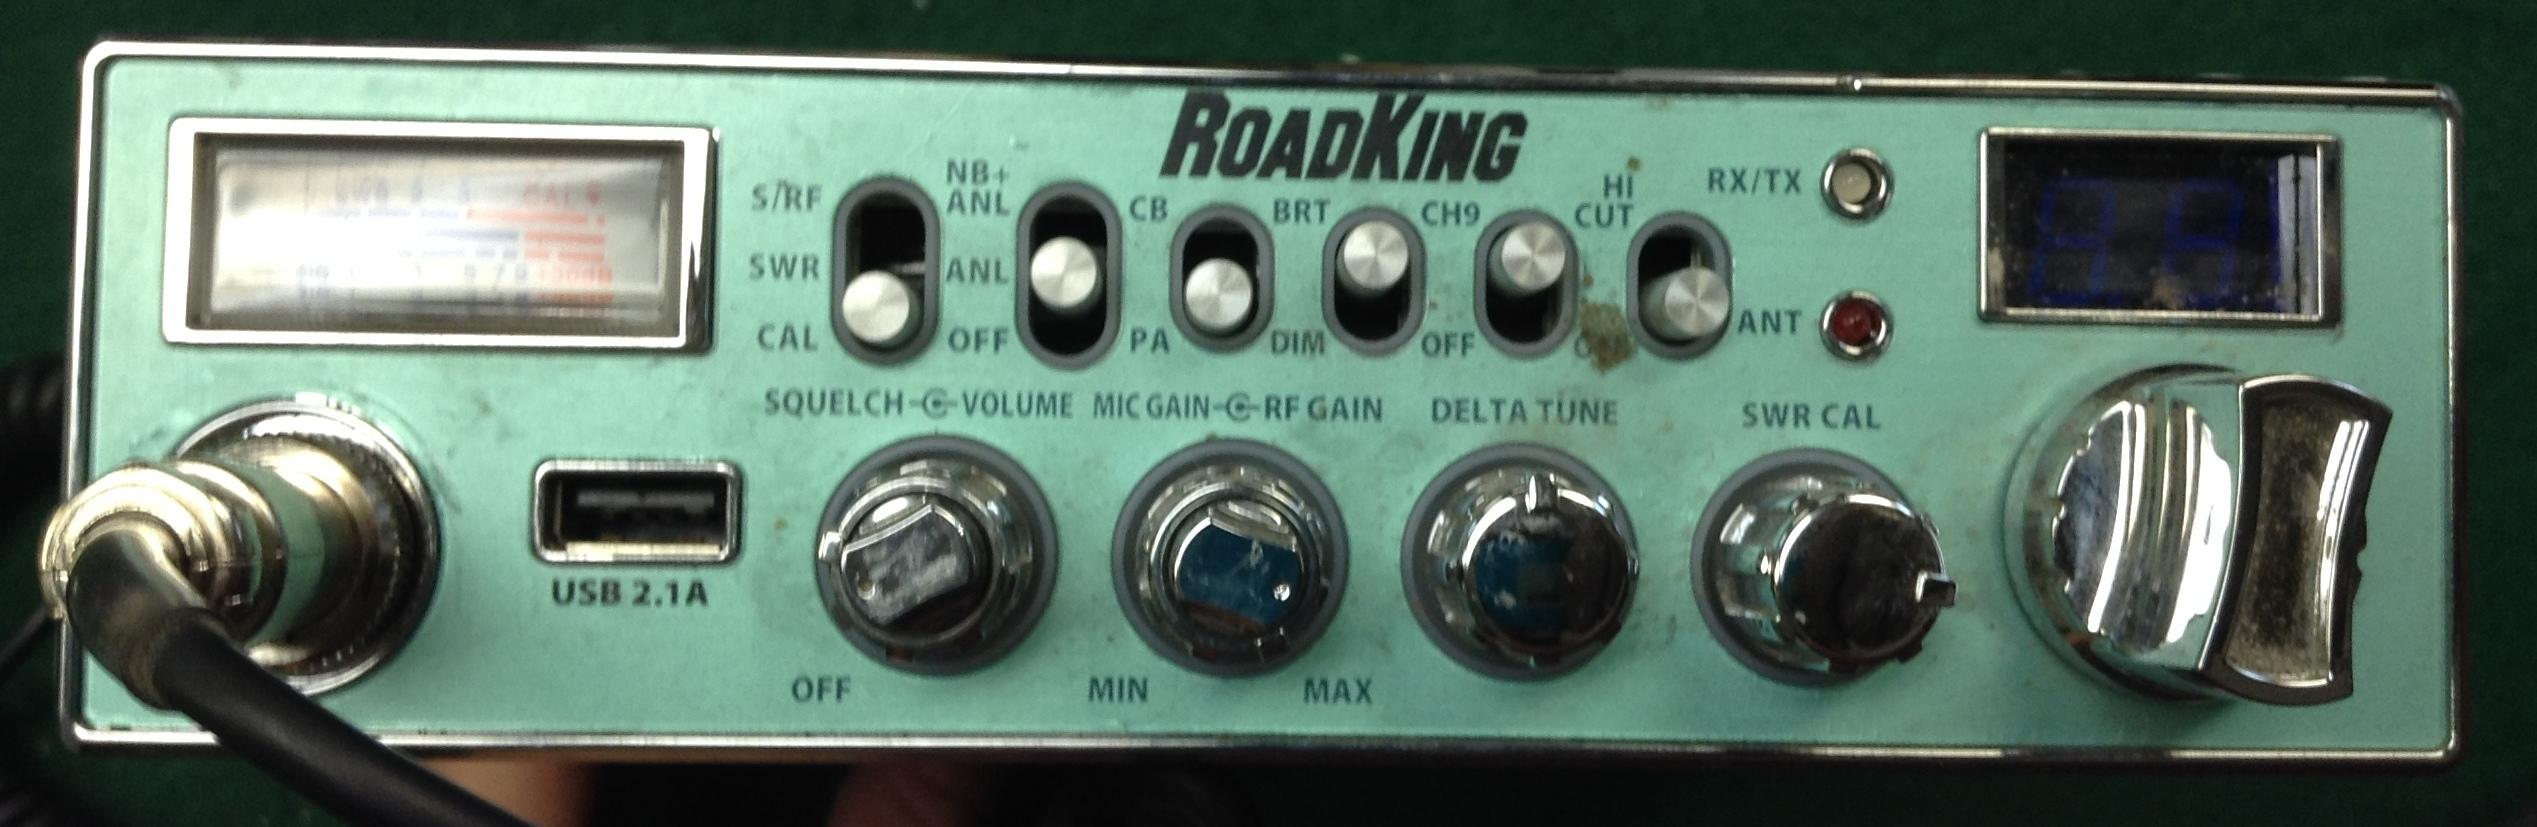 ROADKING Model: RK5640 CB-RADIO WITH HAND MIC